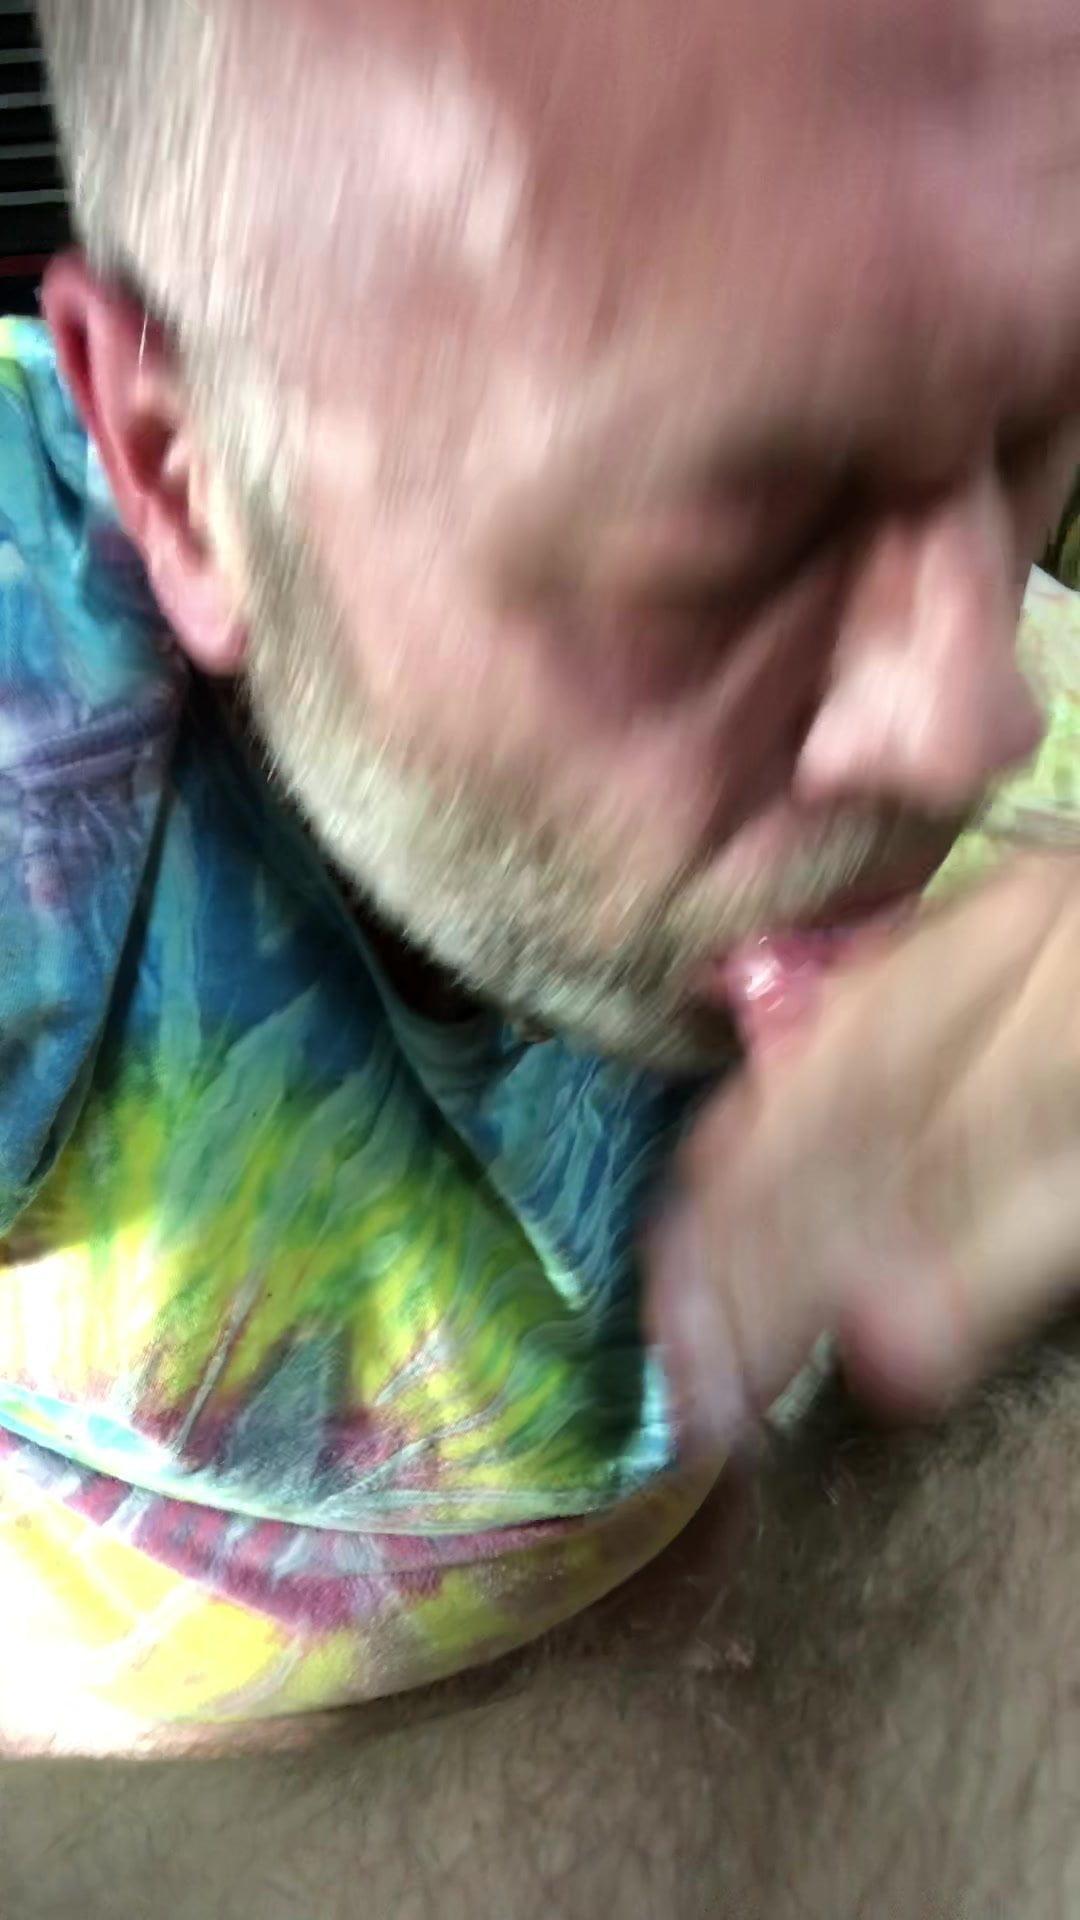 Lengthy BJ Ends With CIM, Cum Play, Cum Slurping, Cum Swallow